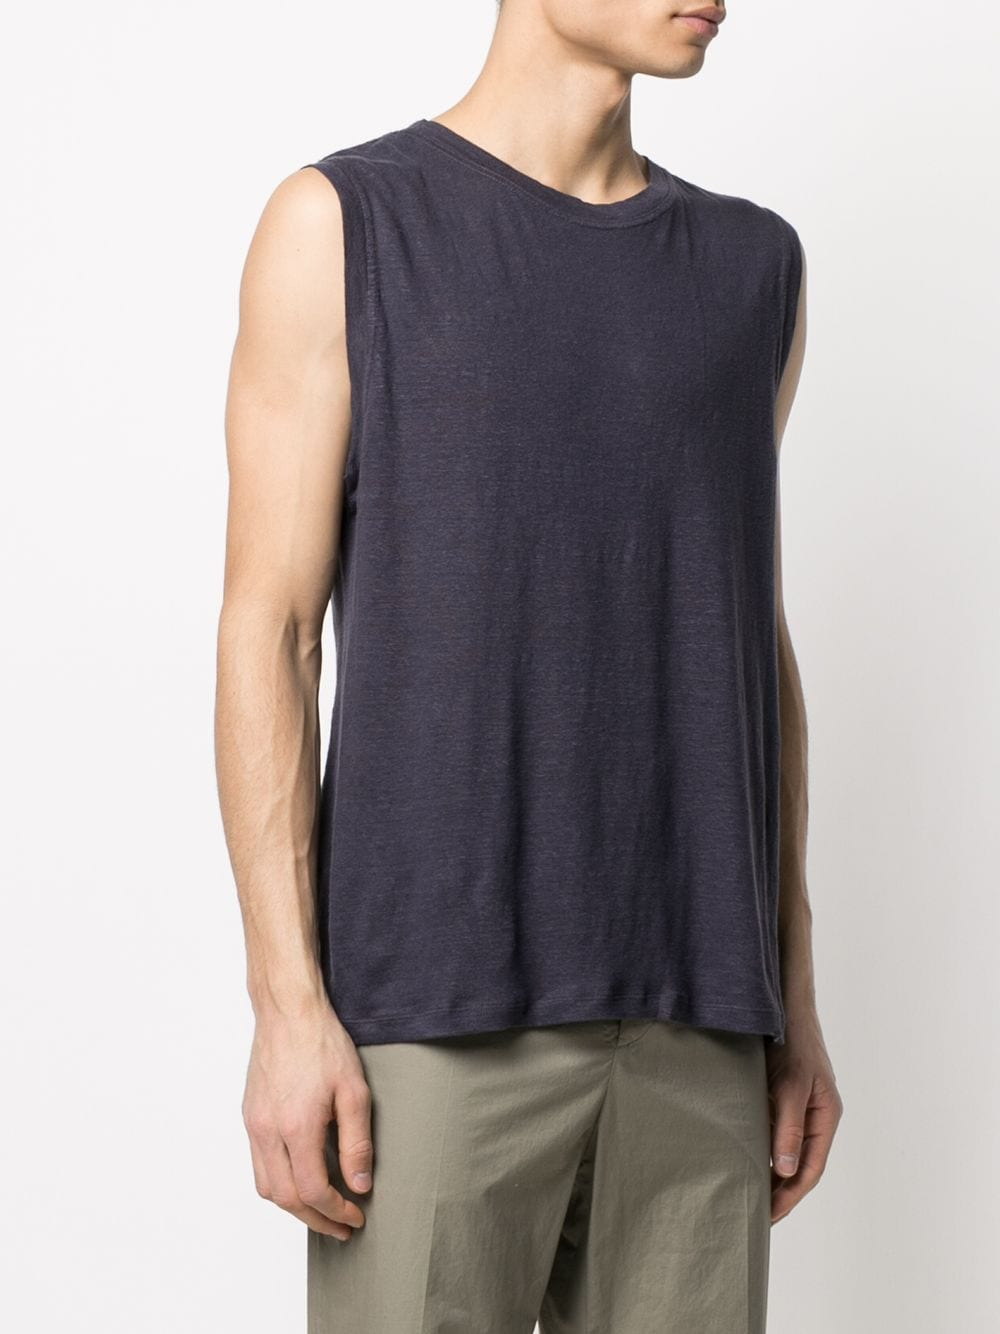 Cornell t-shirt Black Man Cotton ISABEL MARANT   T-shirts   TS0698-21P039H30FN